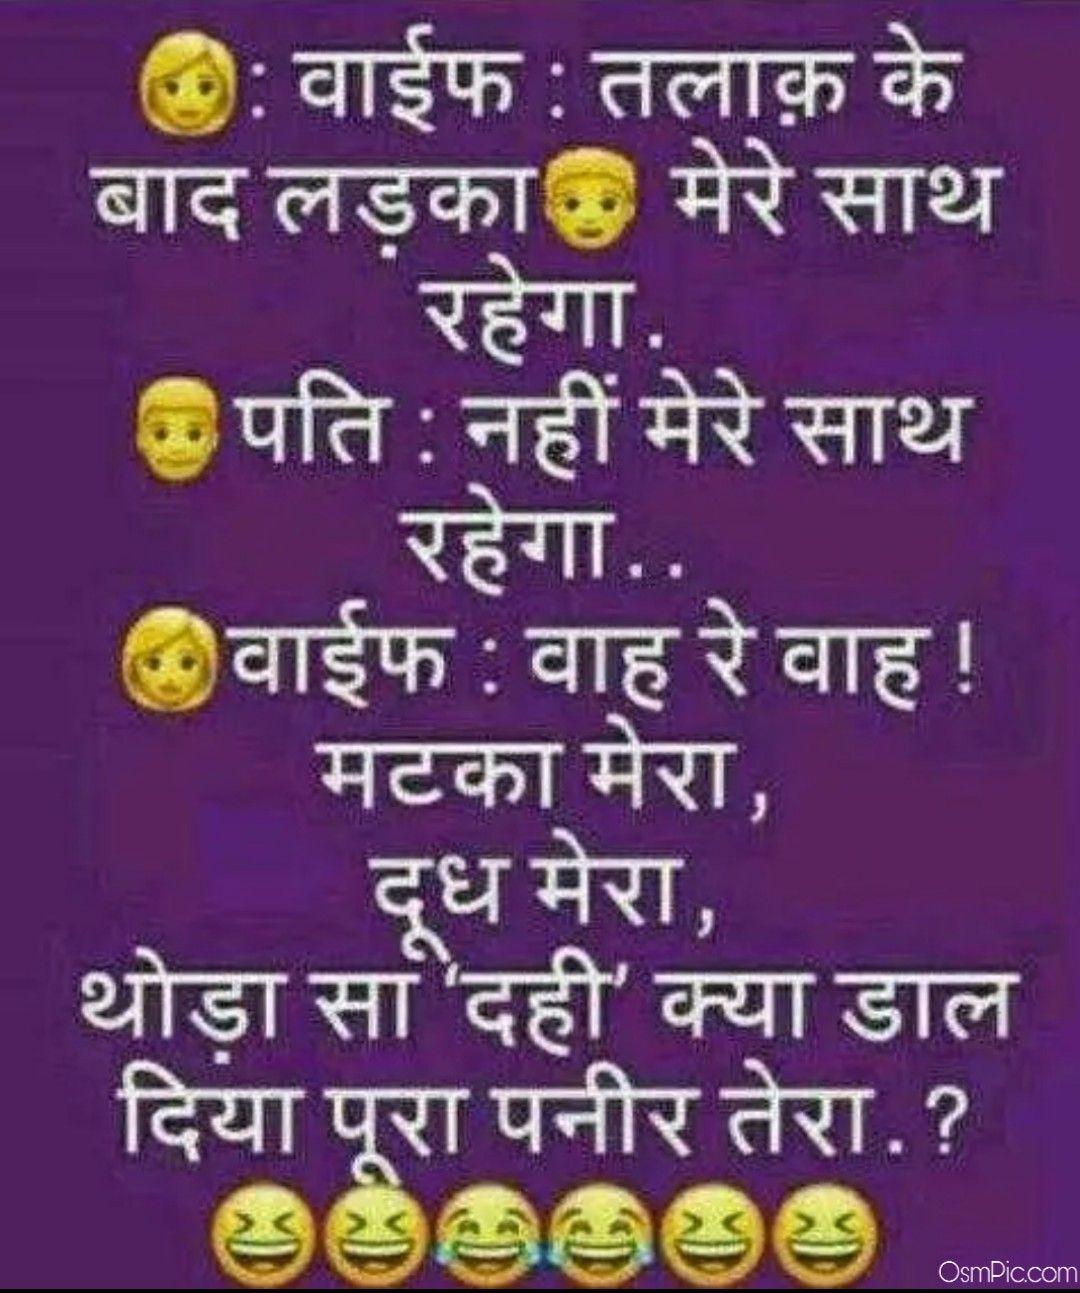 2019 Funny Non Veg Hindi Jokes Images Photos For Whatsapp